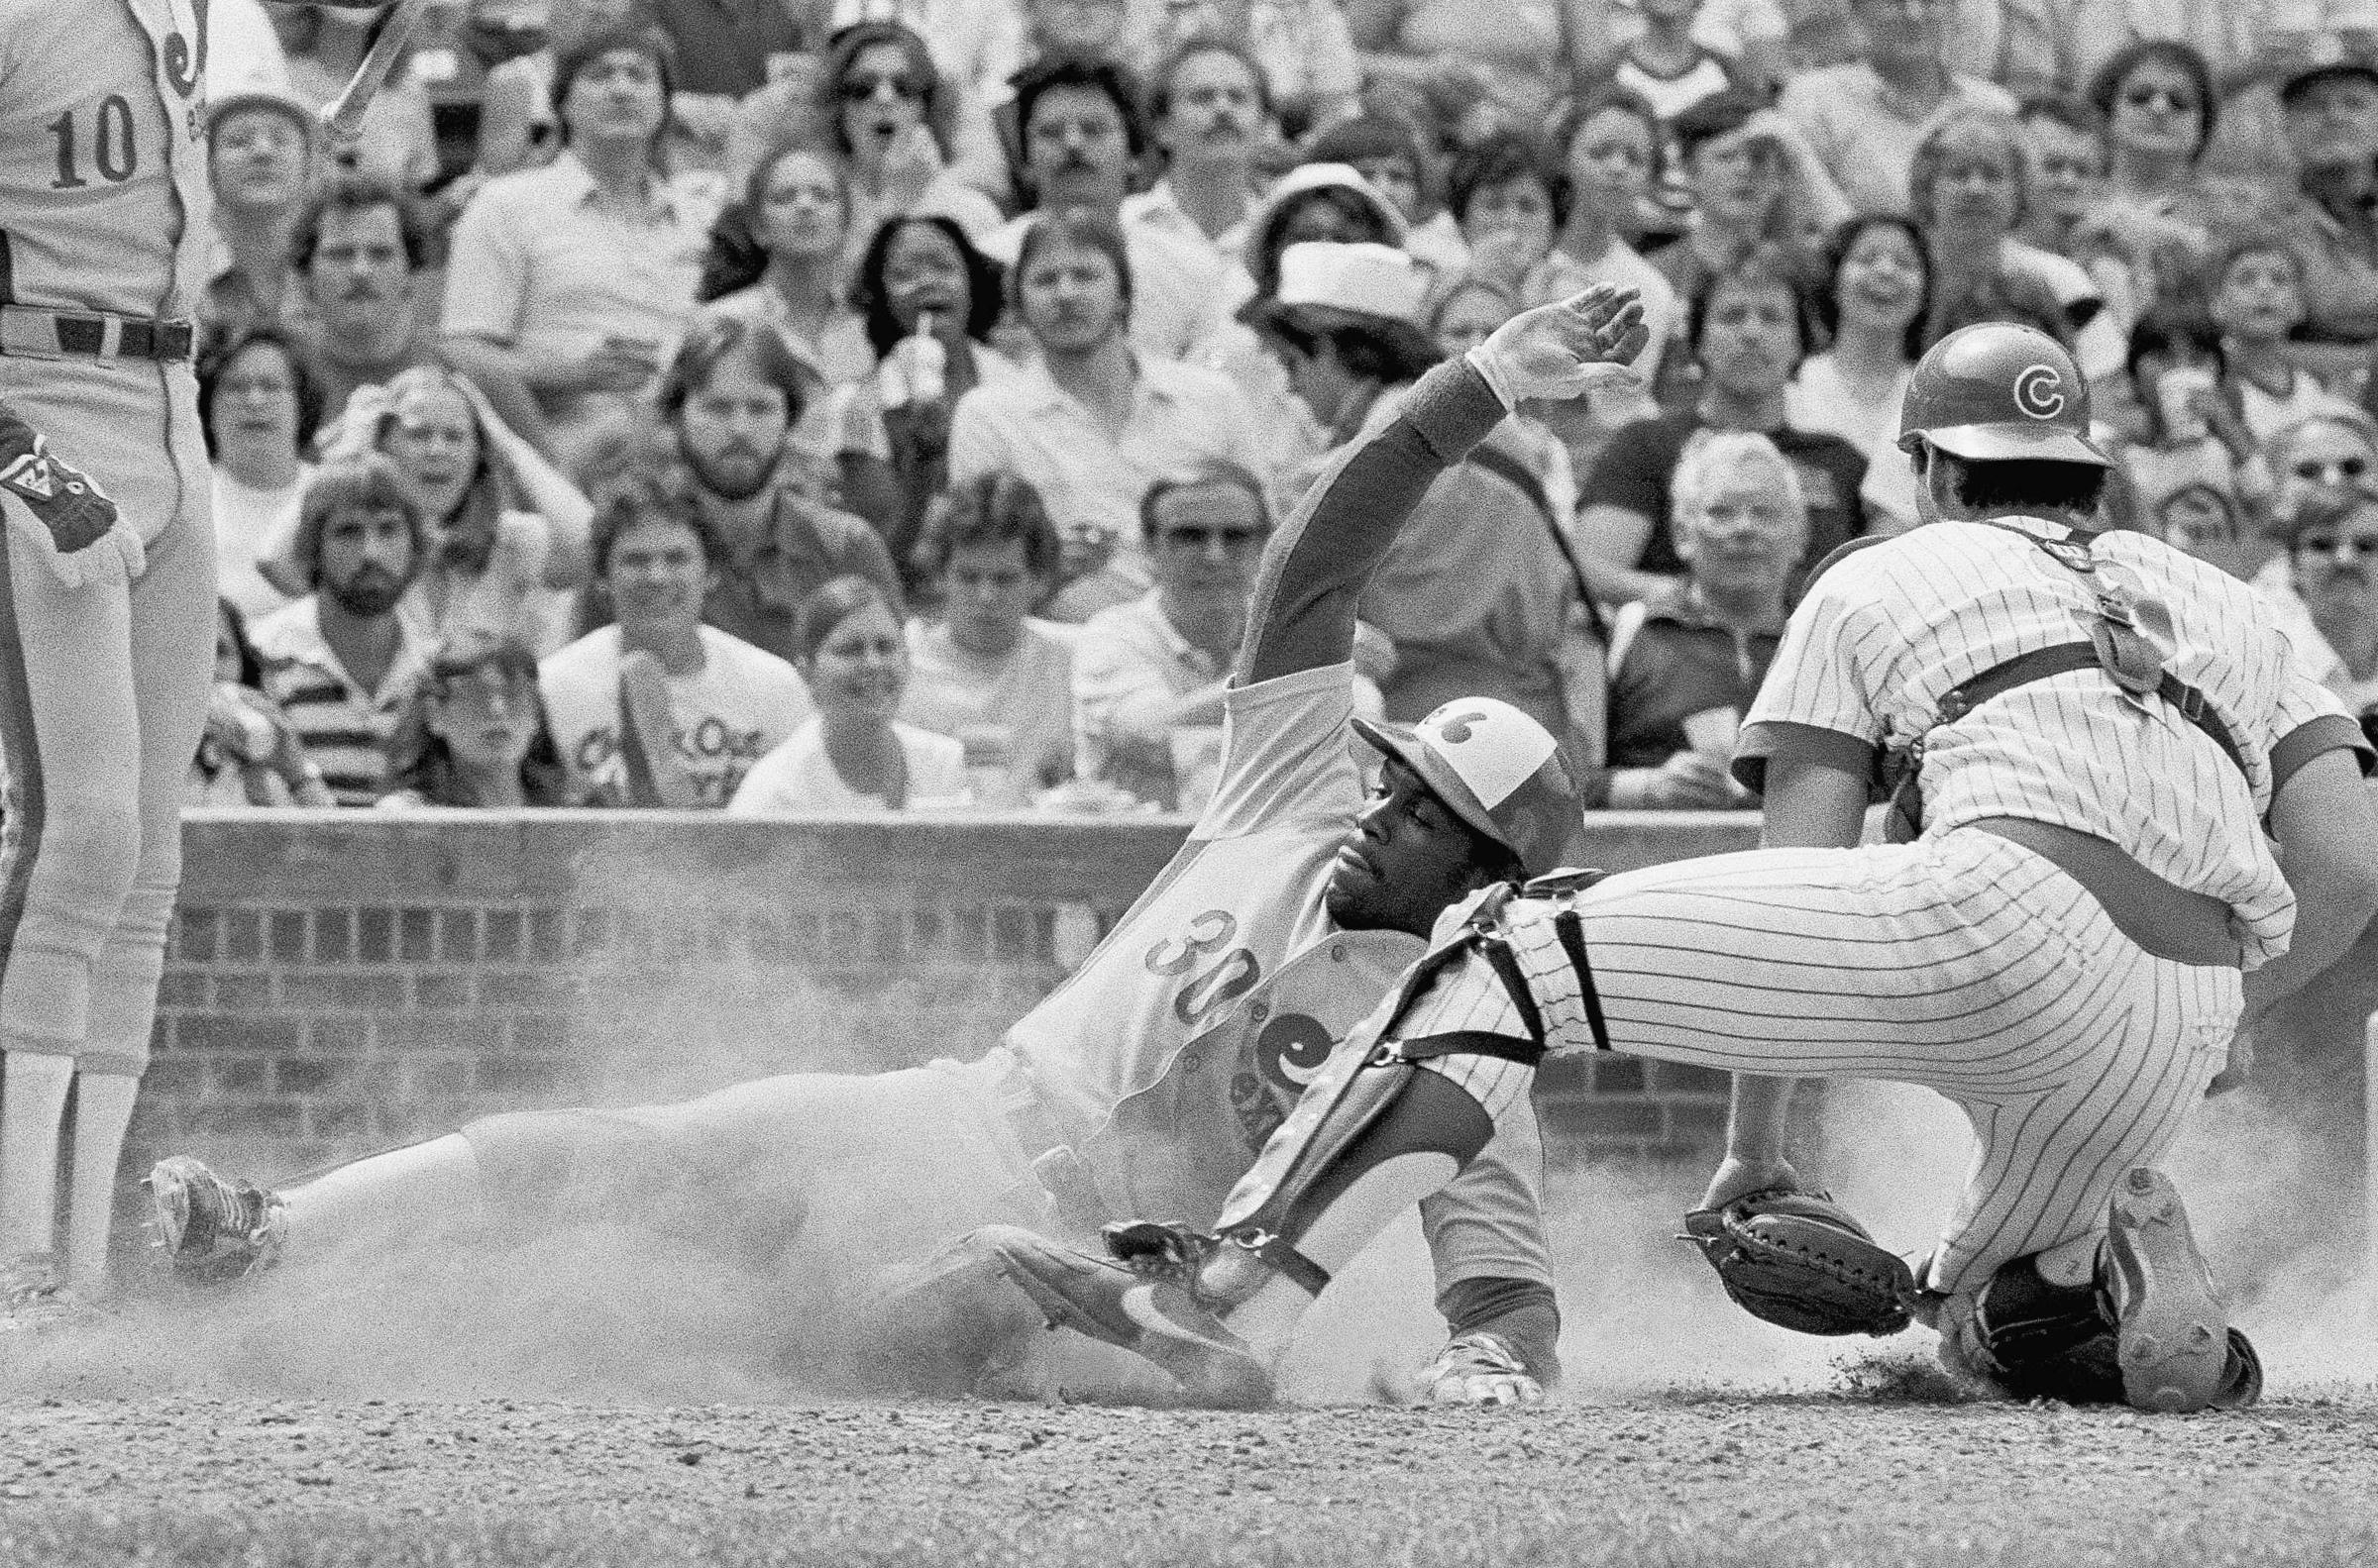 Spring_training_art_of_the_steal_baseball_47786